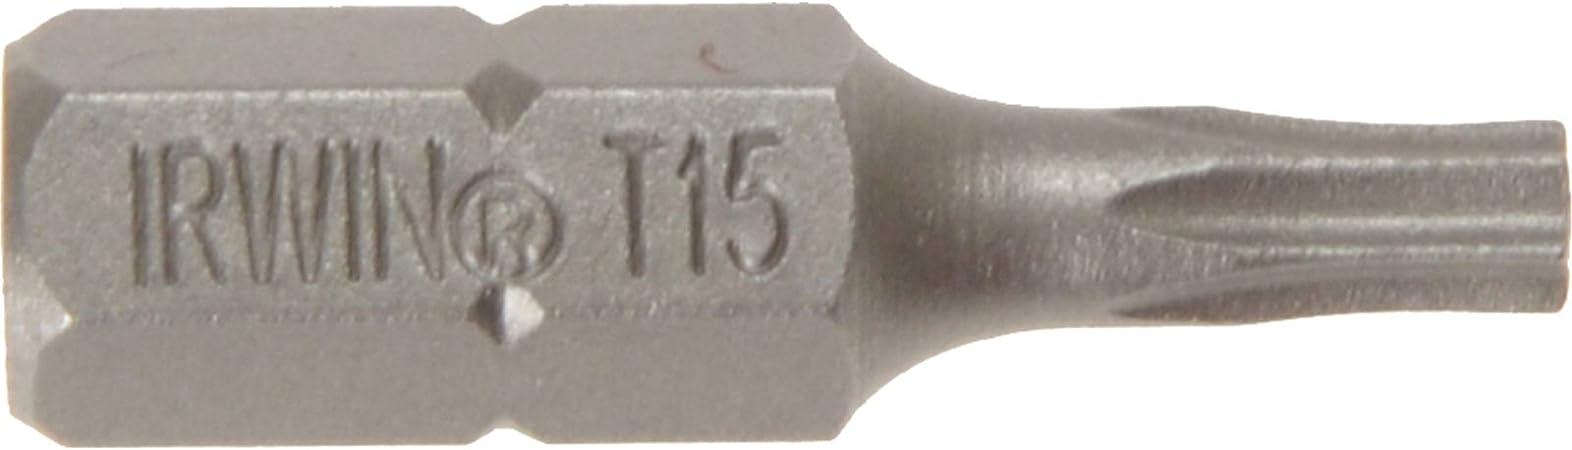 IRWIN Impact embouts de tournevis Torx TX27 25 mm Pack de 2